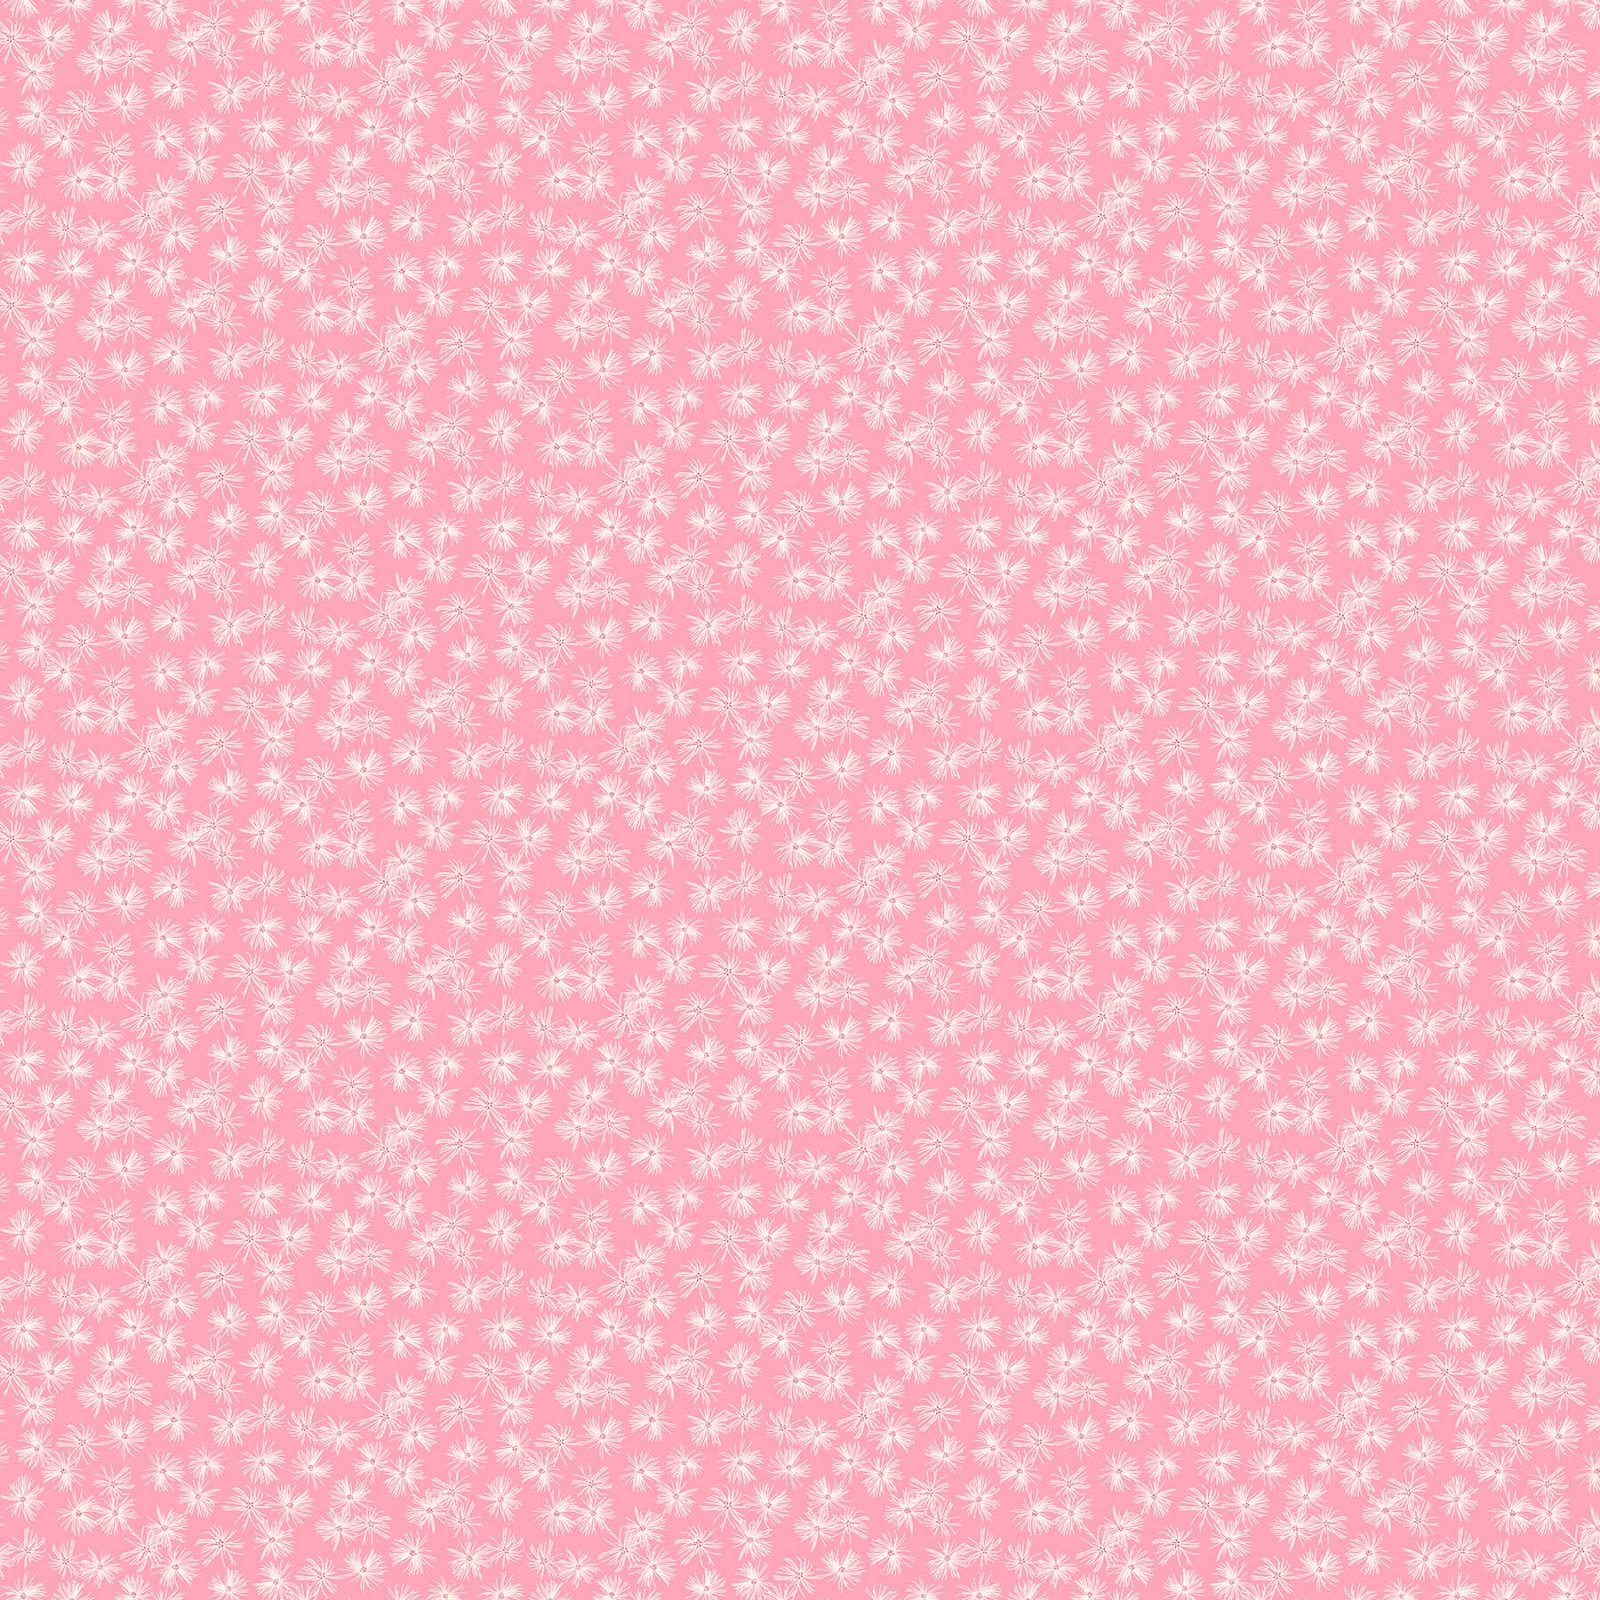 90005/21 Pink: Mountain Meadow (Pippa Shaw)